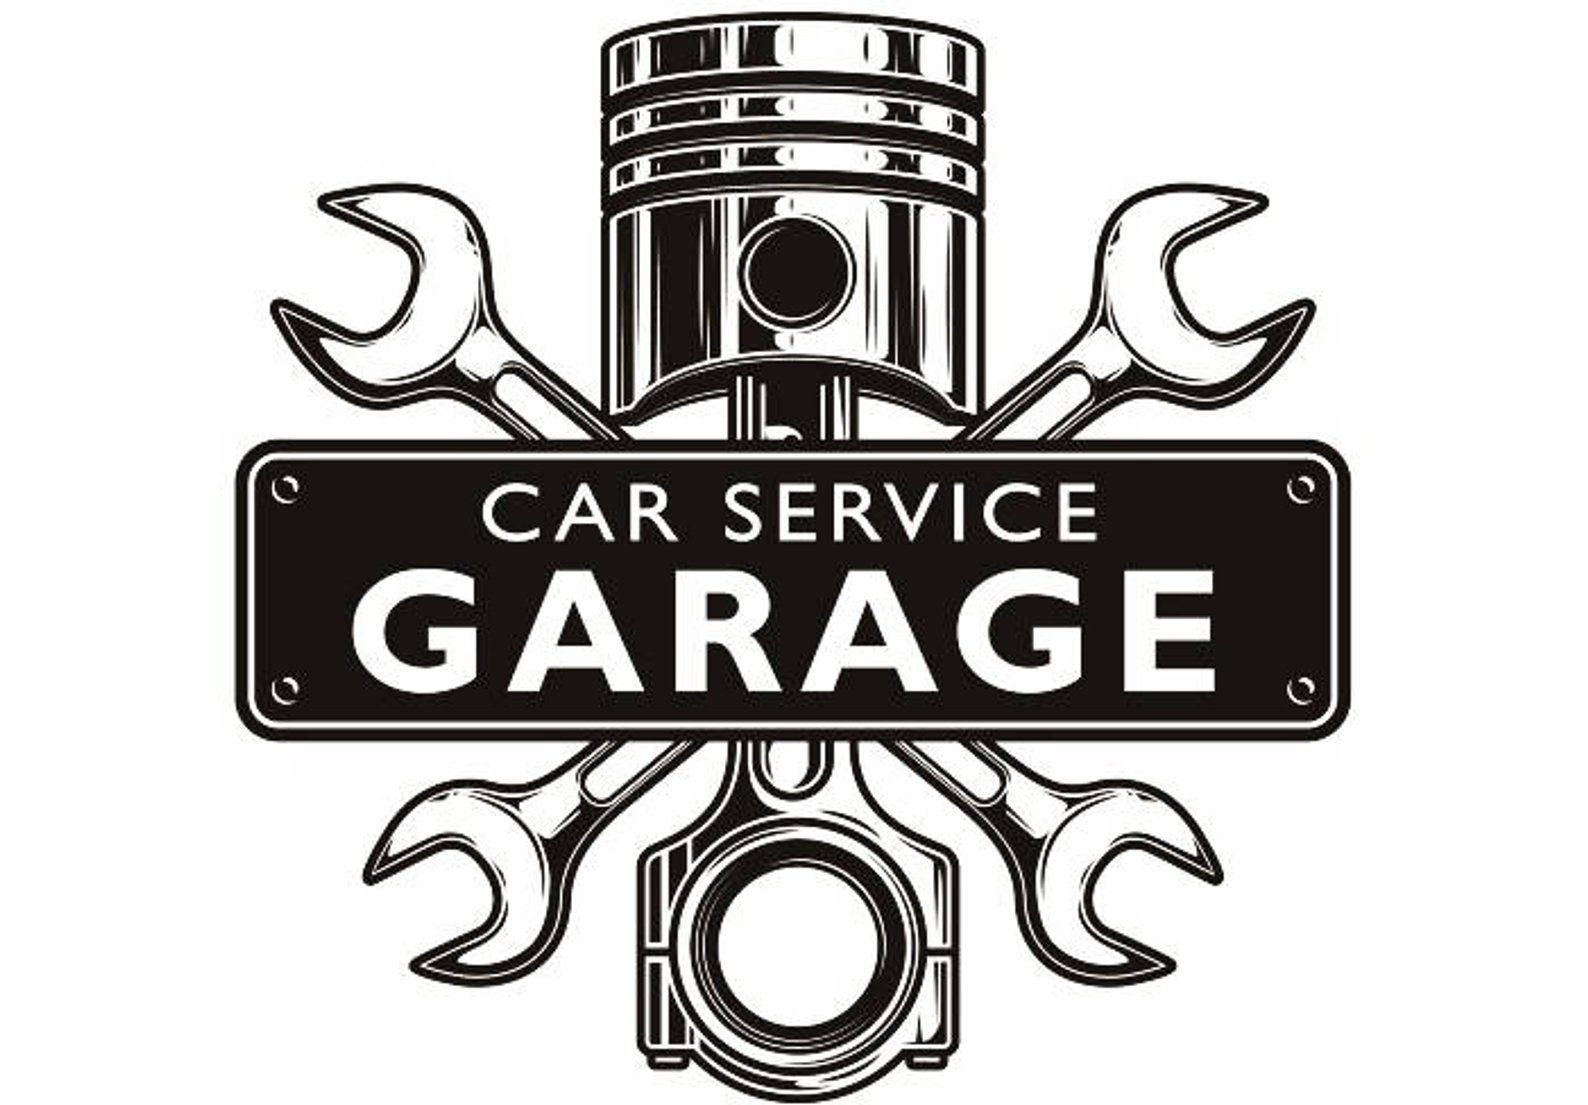 Mechanic Logo 3 Piston Wrench Crossed Engine Car Auto